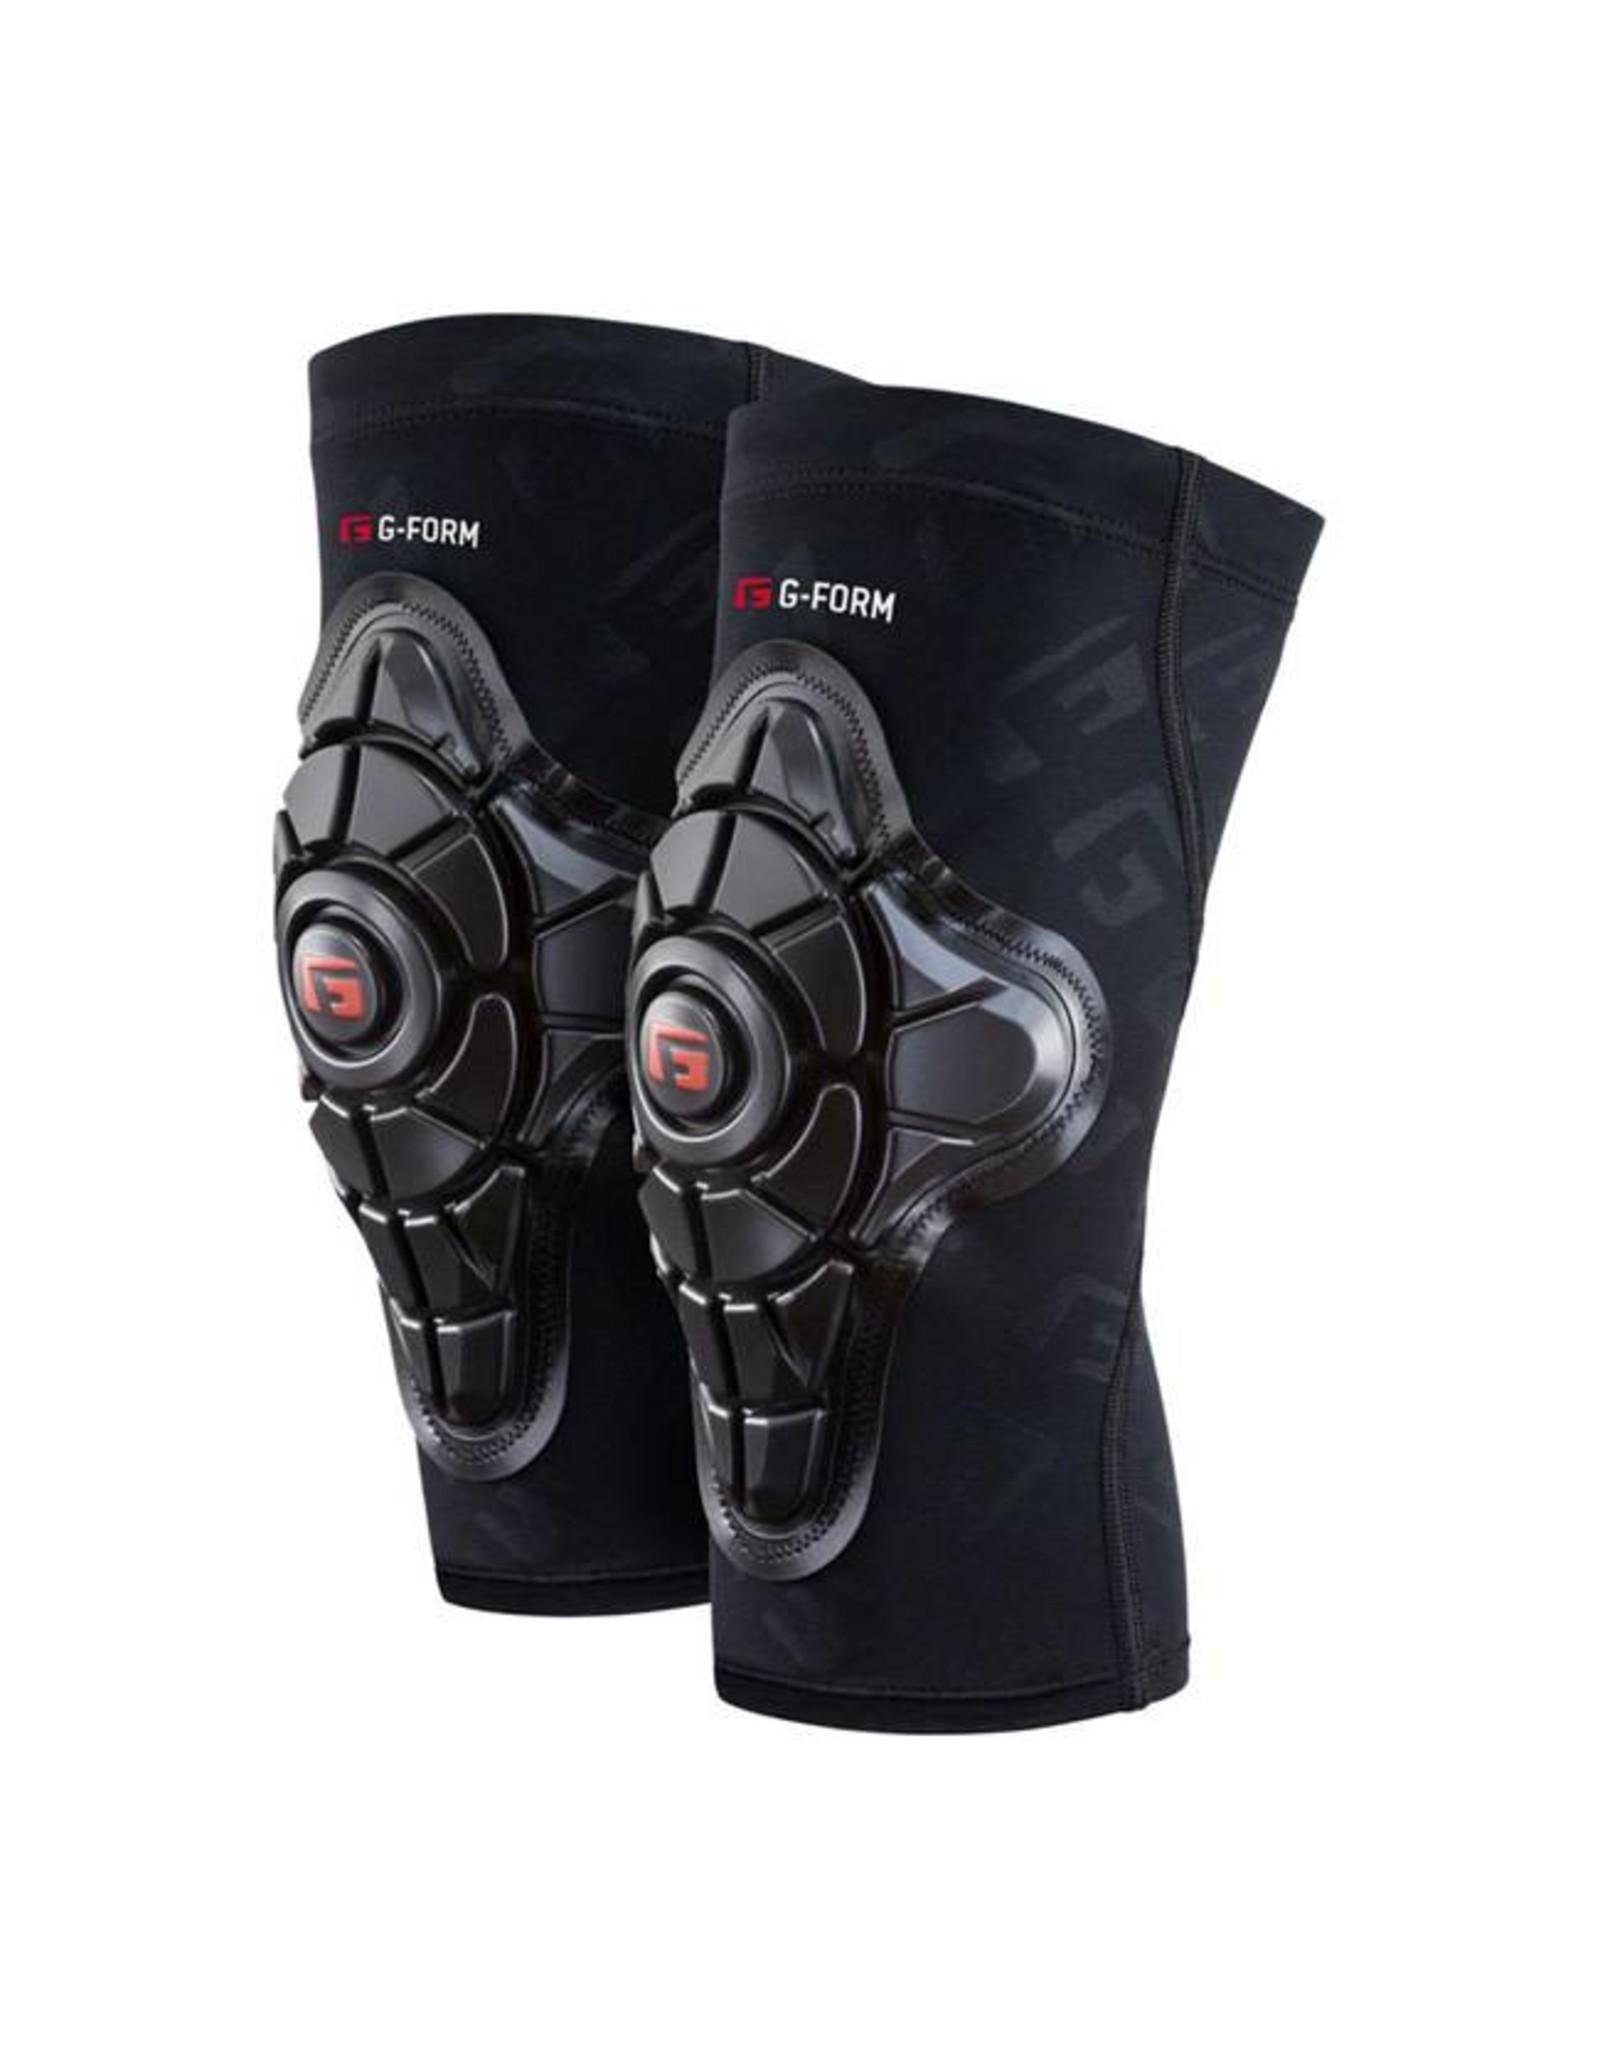 G-Form G-Form Pro-X Knee Pad: Black/Embossed G, 2XL